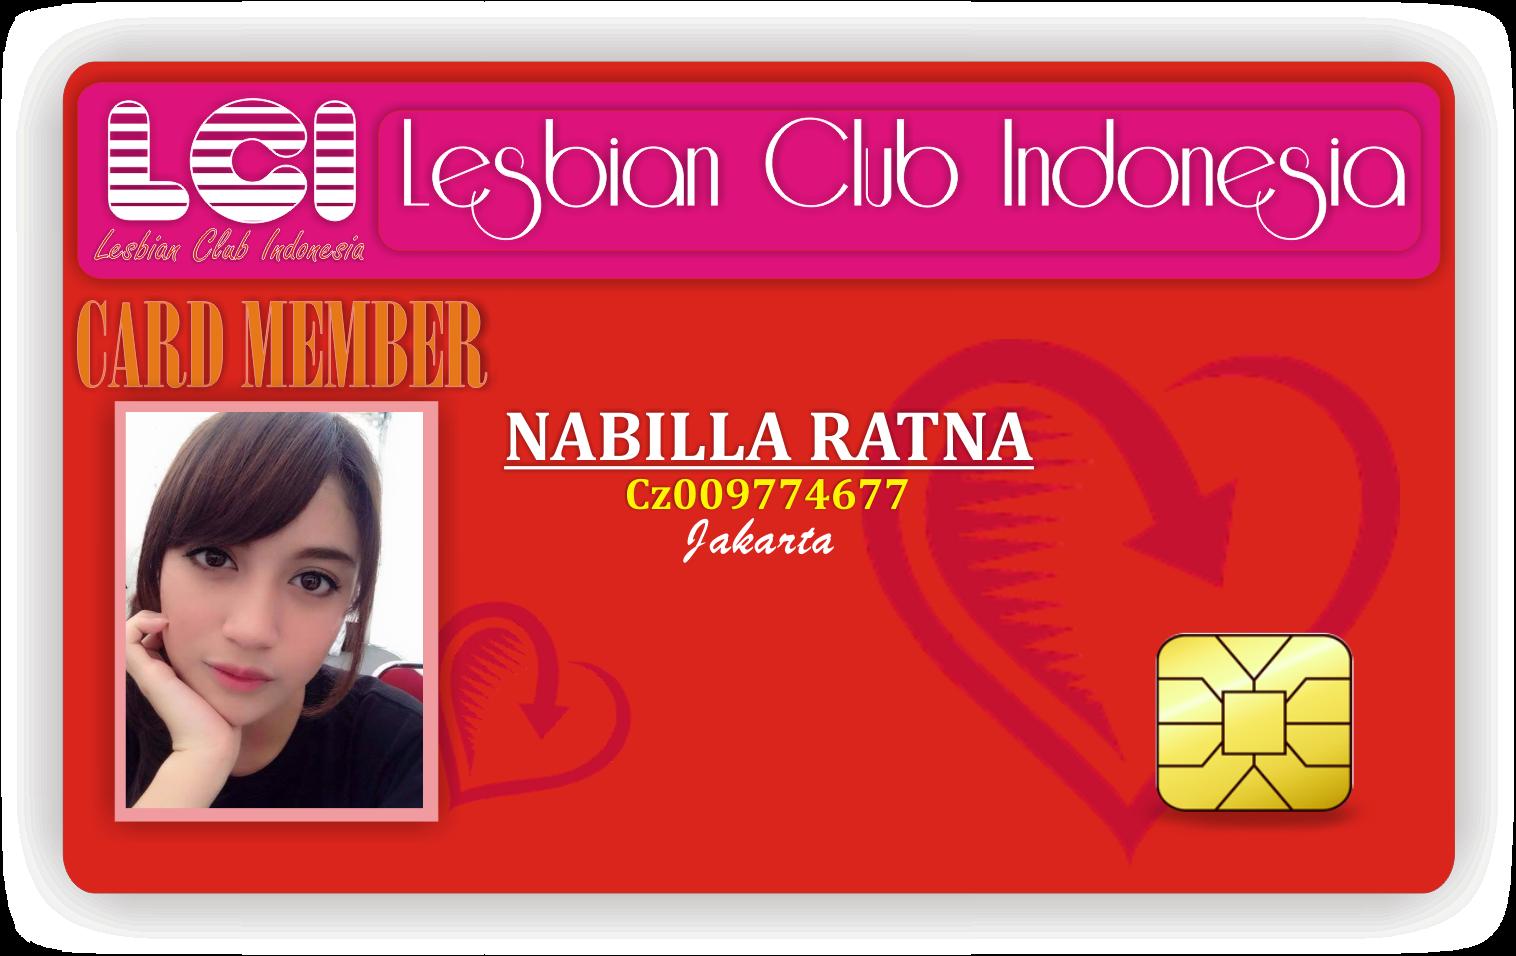 Indonesia lesbian club